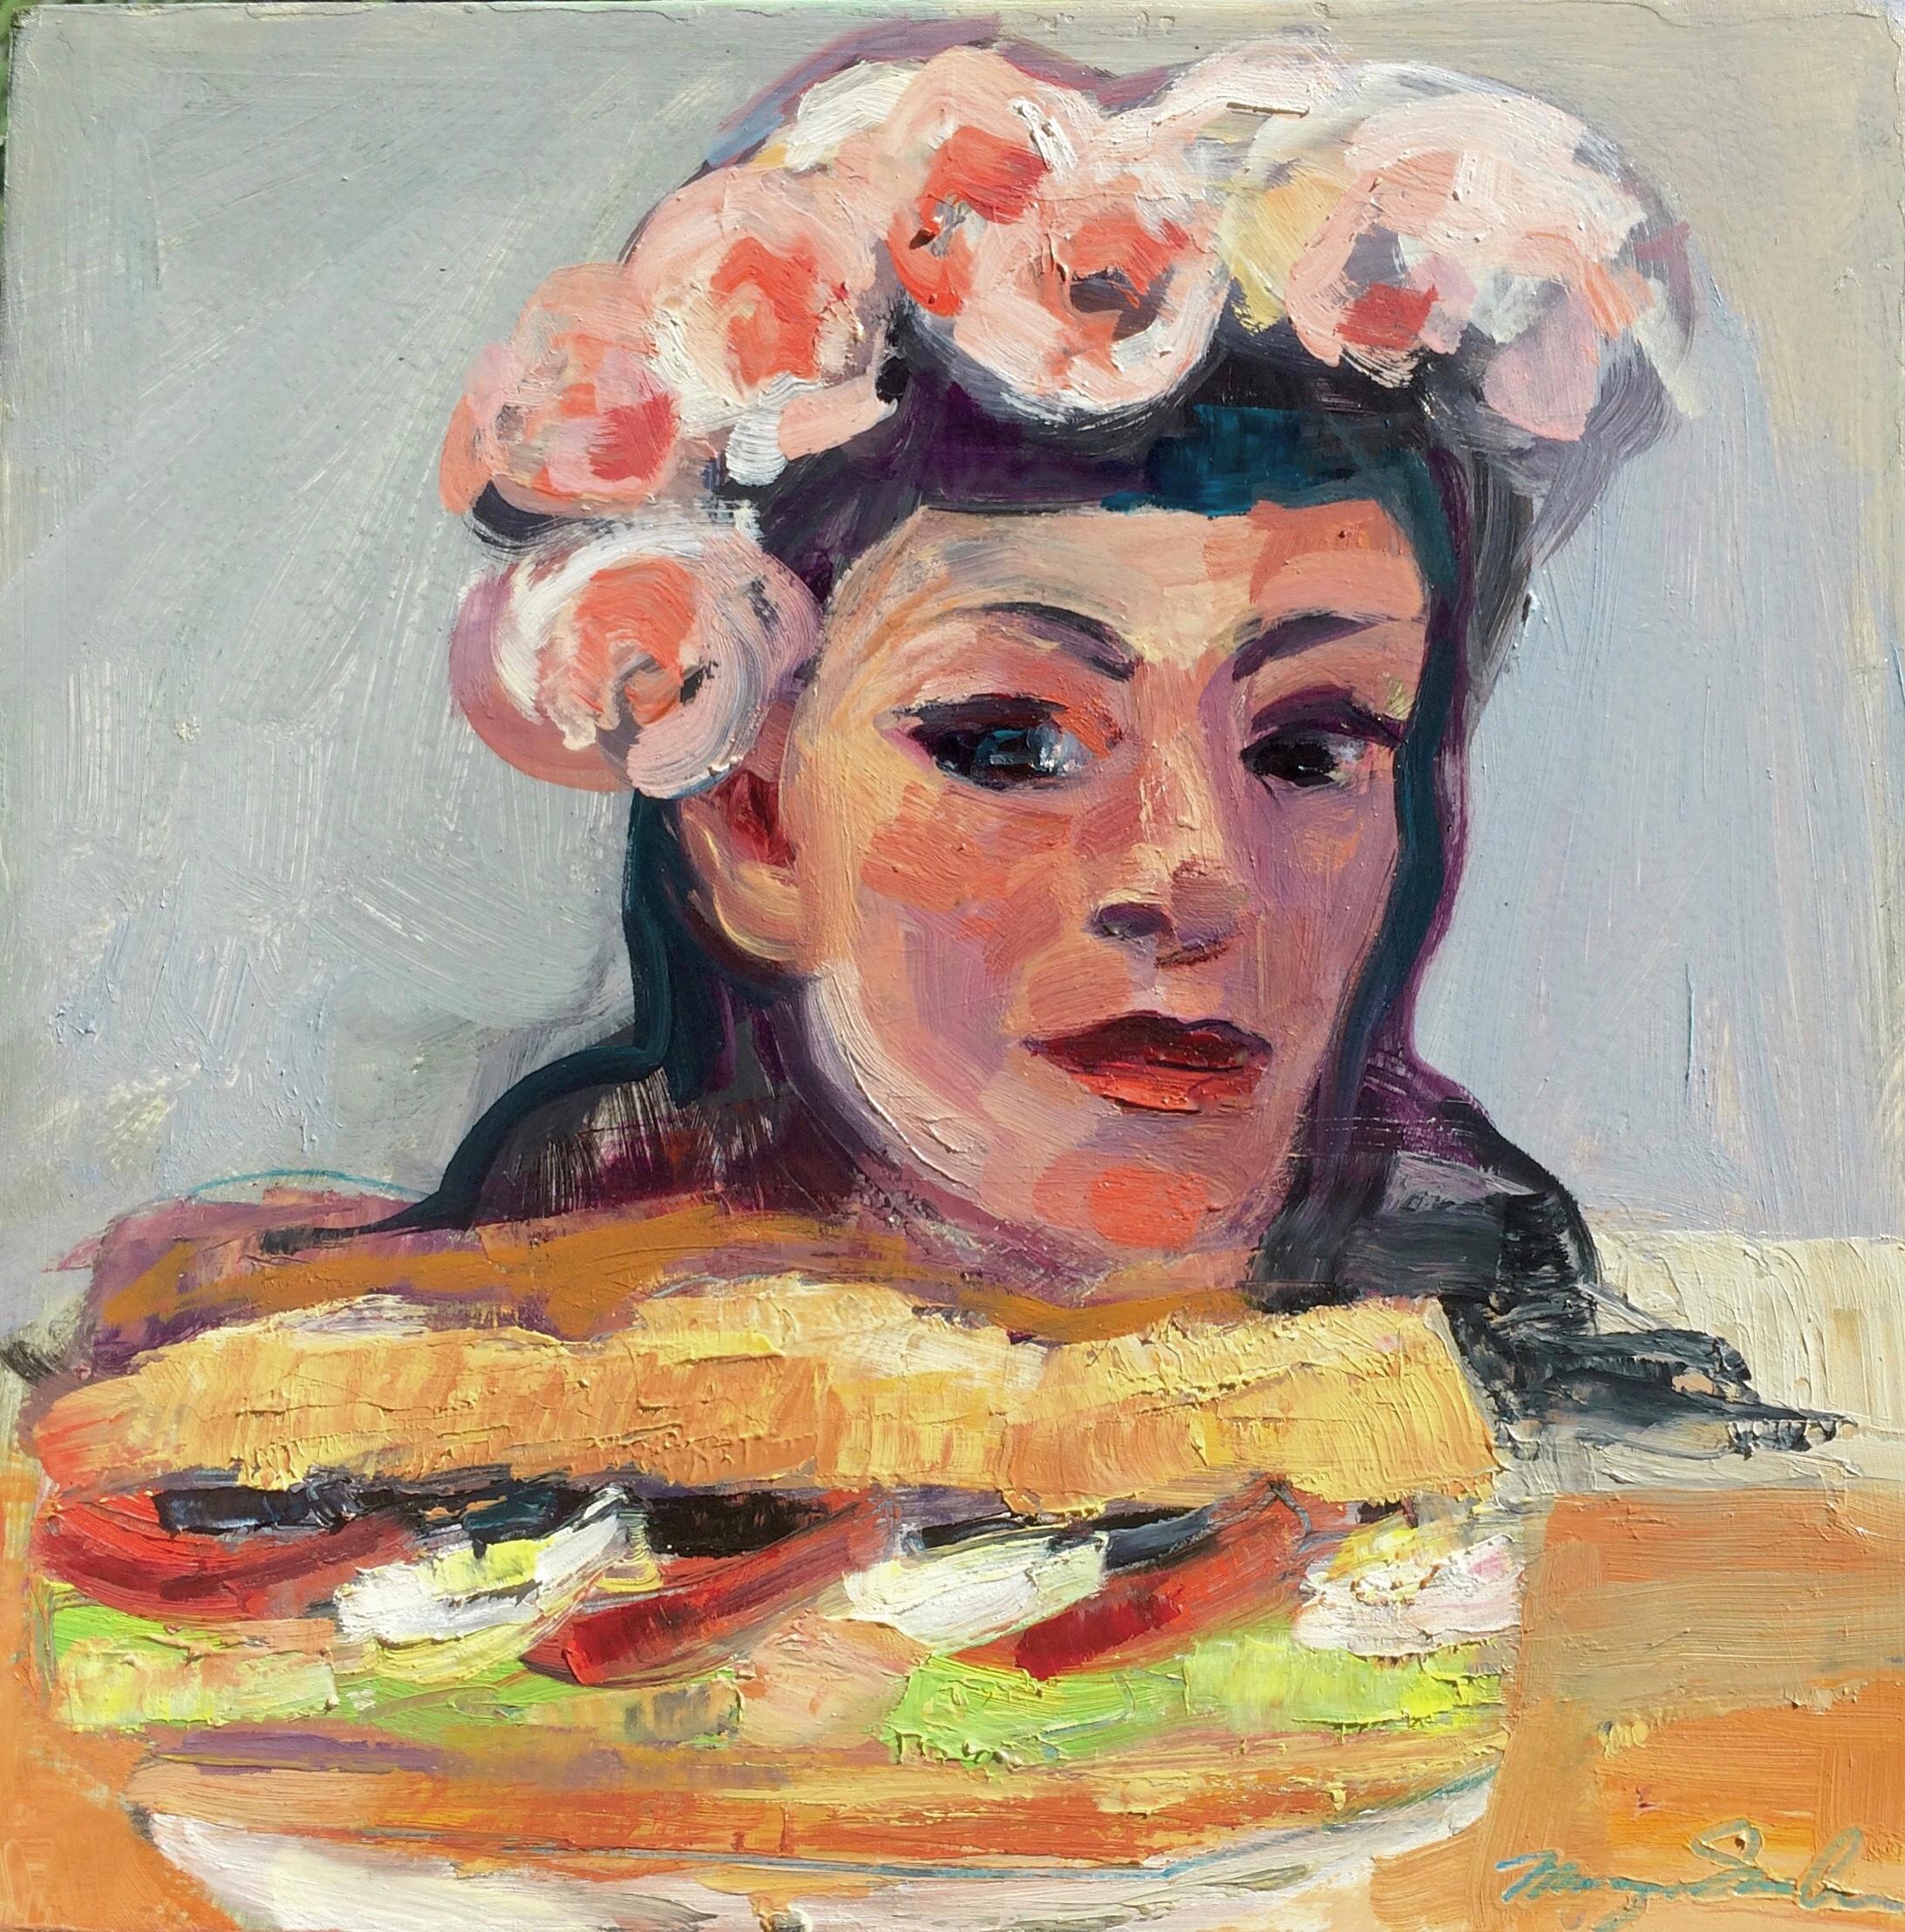 Portrait of monique with pain bagnat oil and mixed media on wood 10x10 igftbj